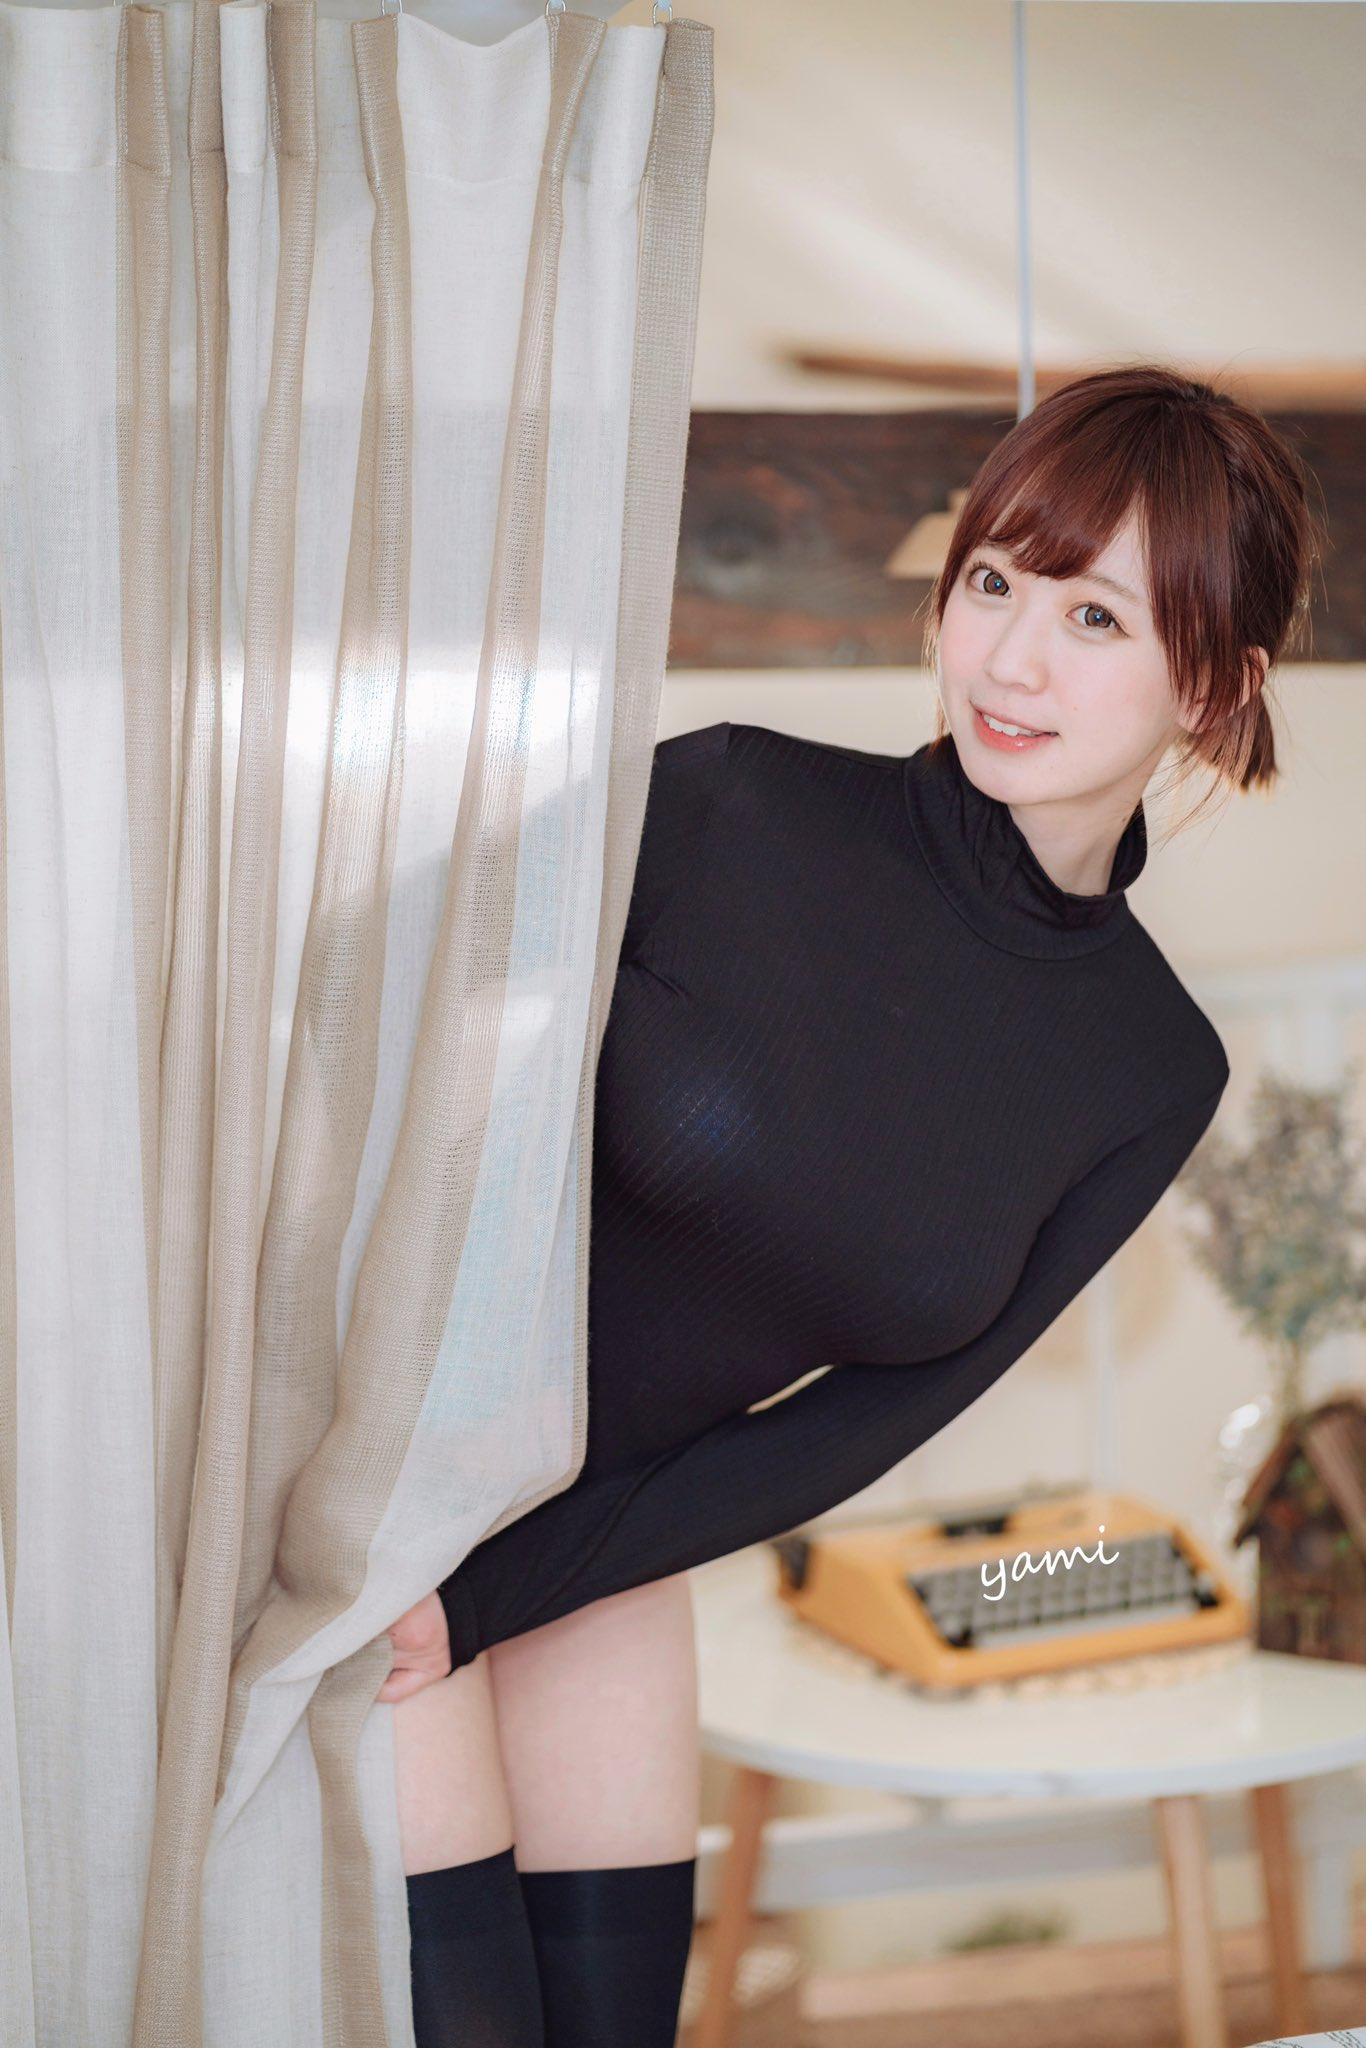 童颜巨乳COSER小姐姐yami推特图集 Yami-twitter3